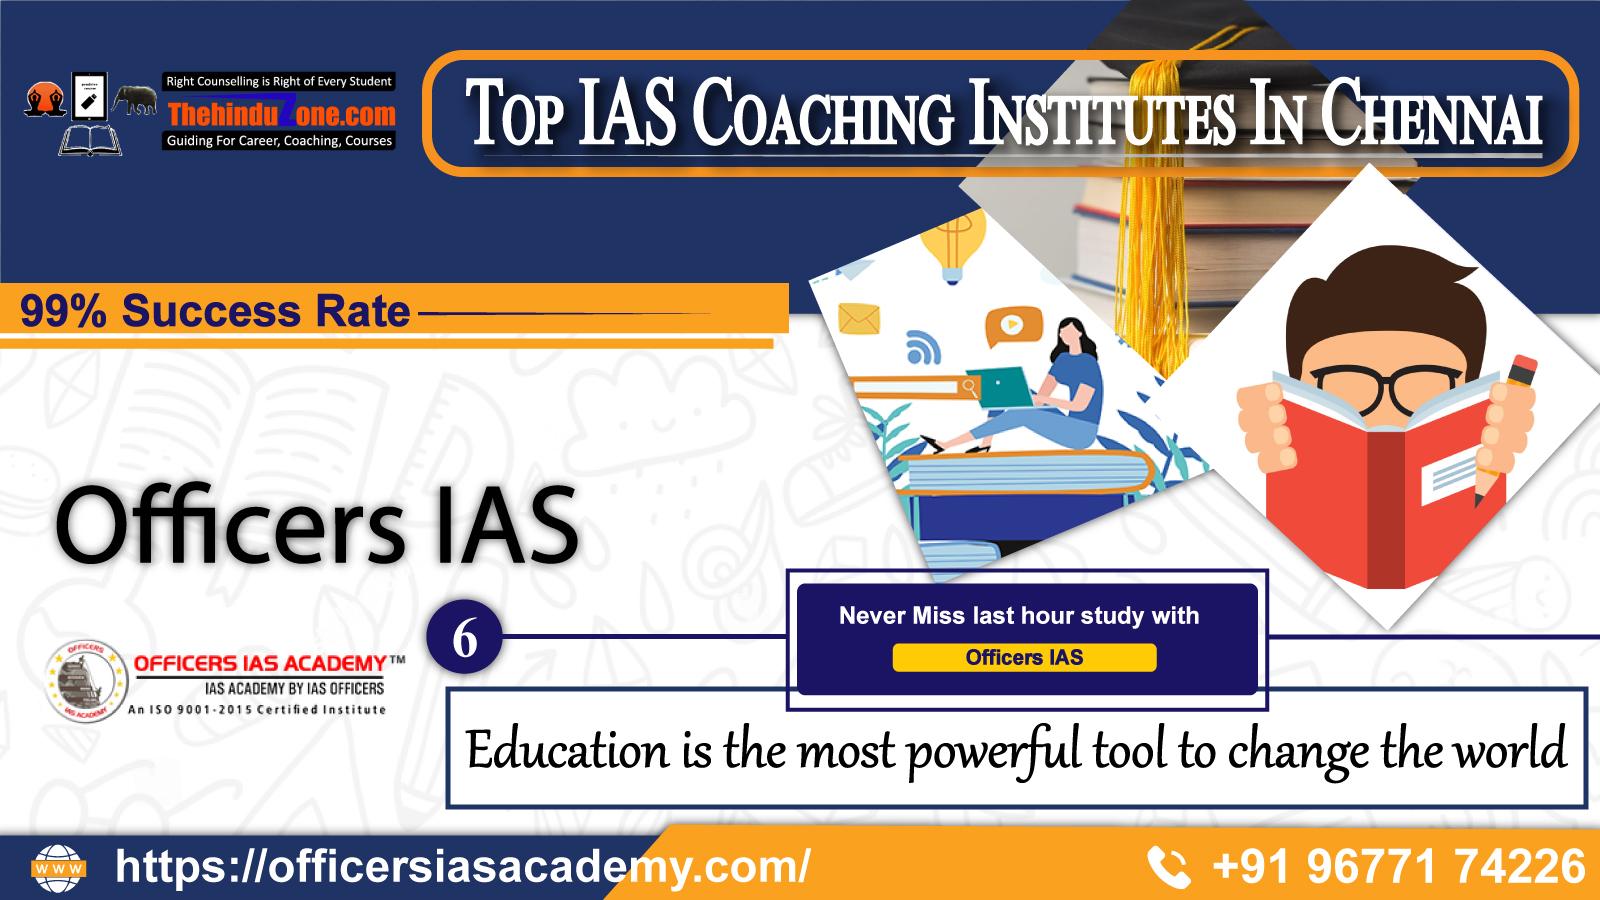 Top IAS Coaching Institutes In Chennai